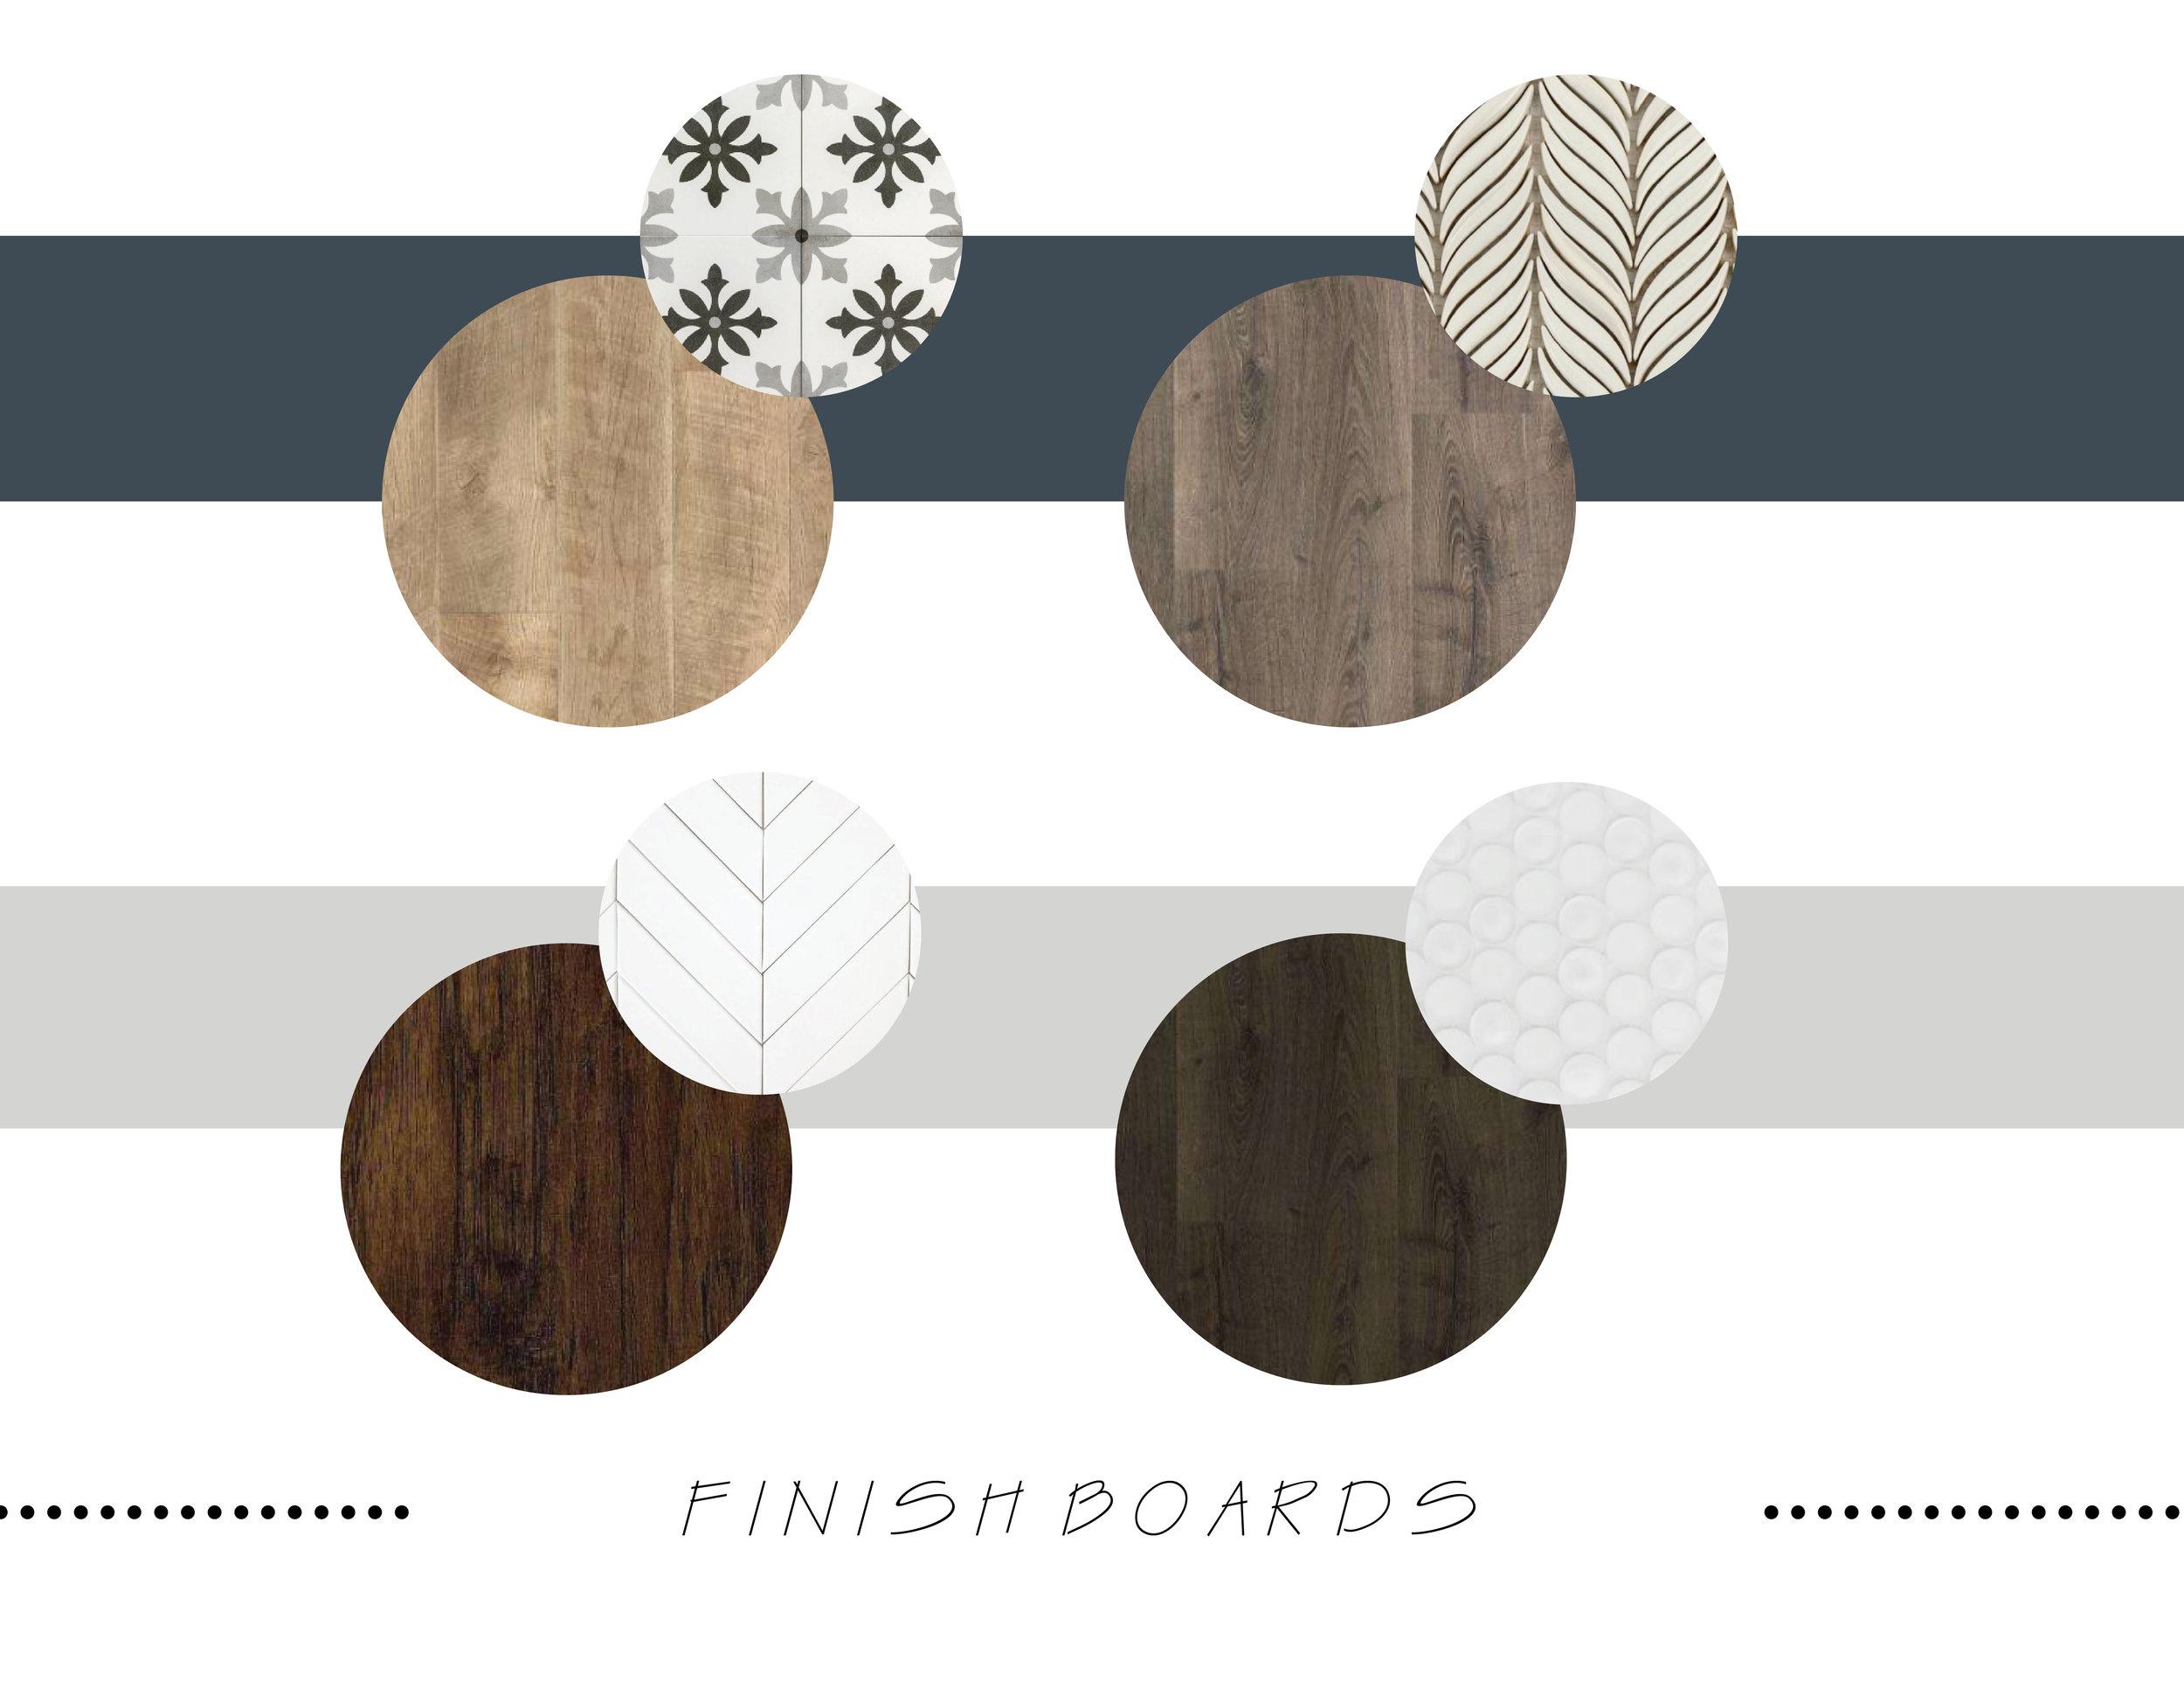 finish boards4.jpg